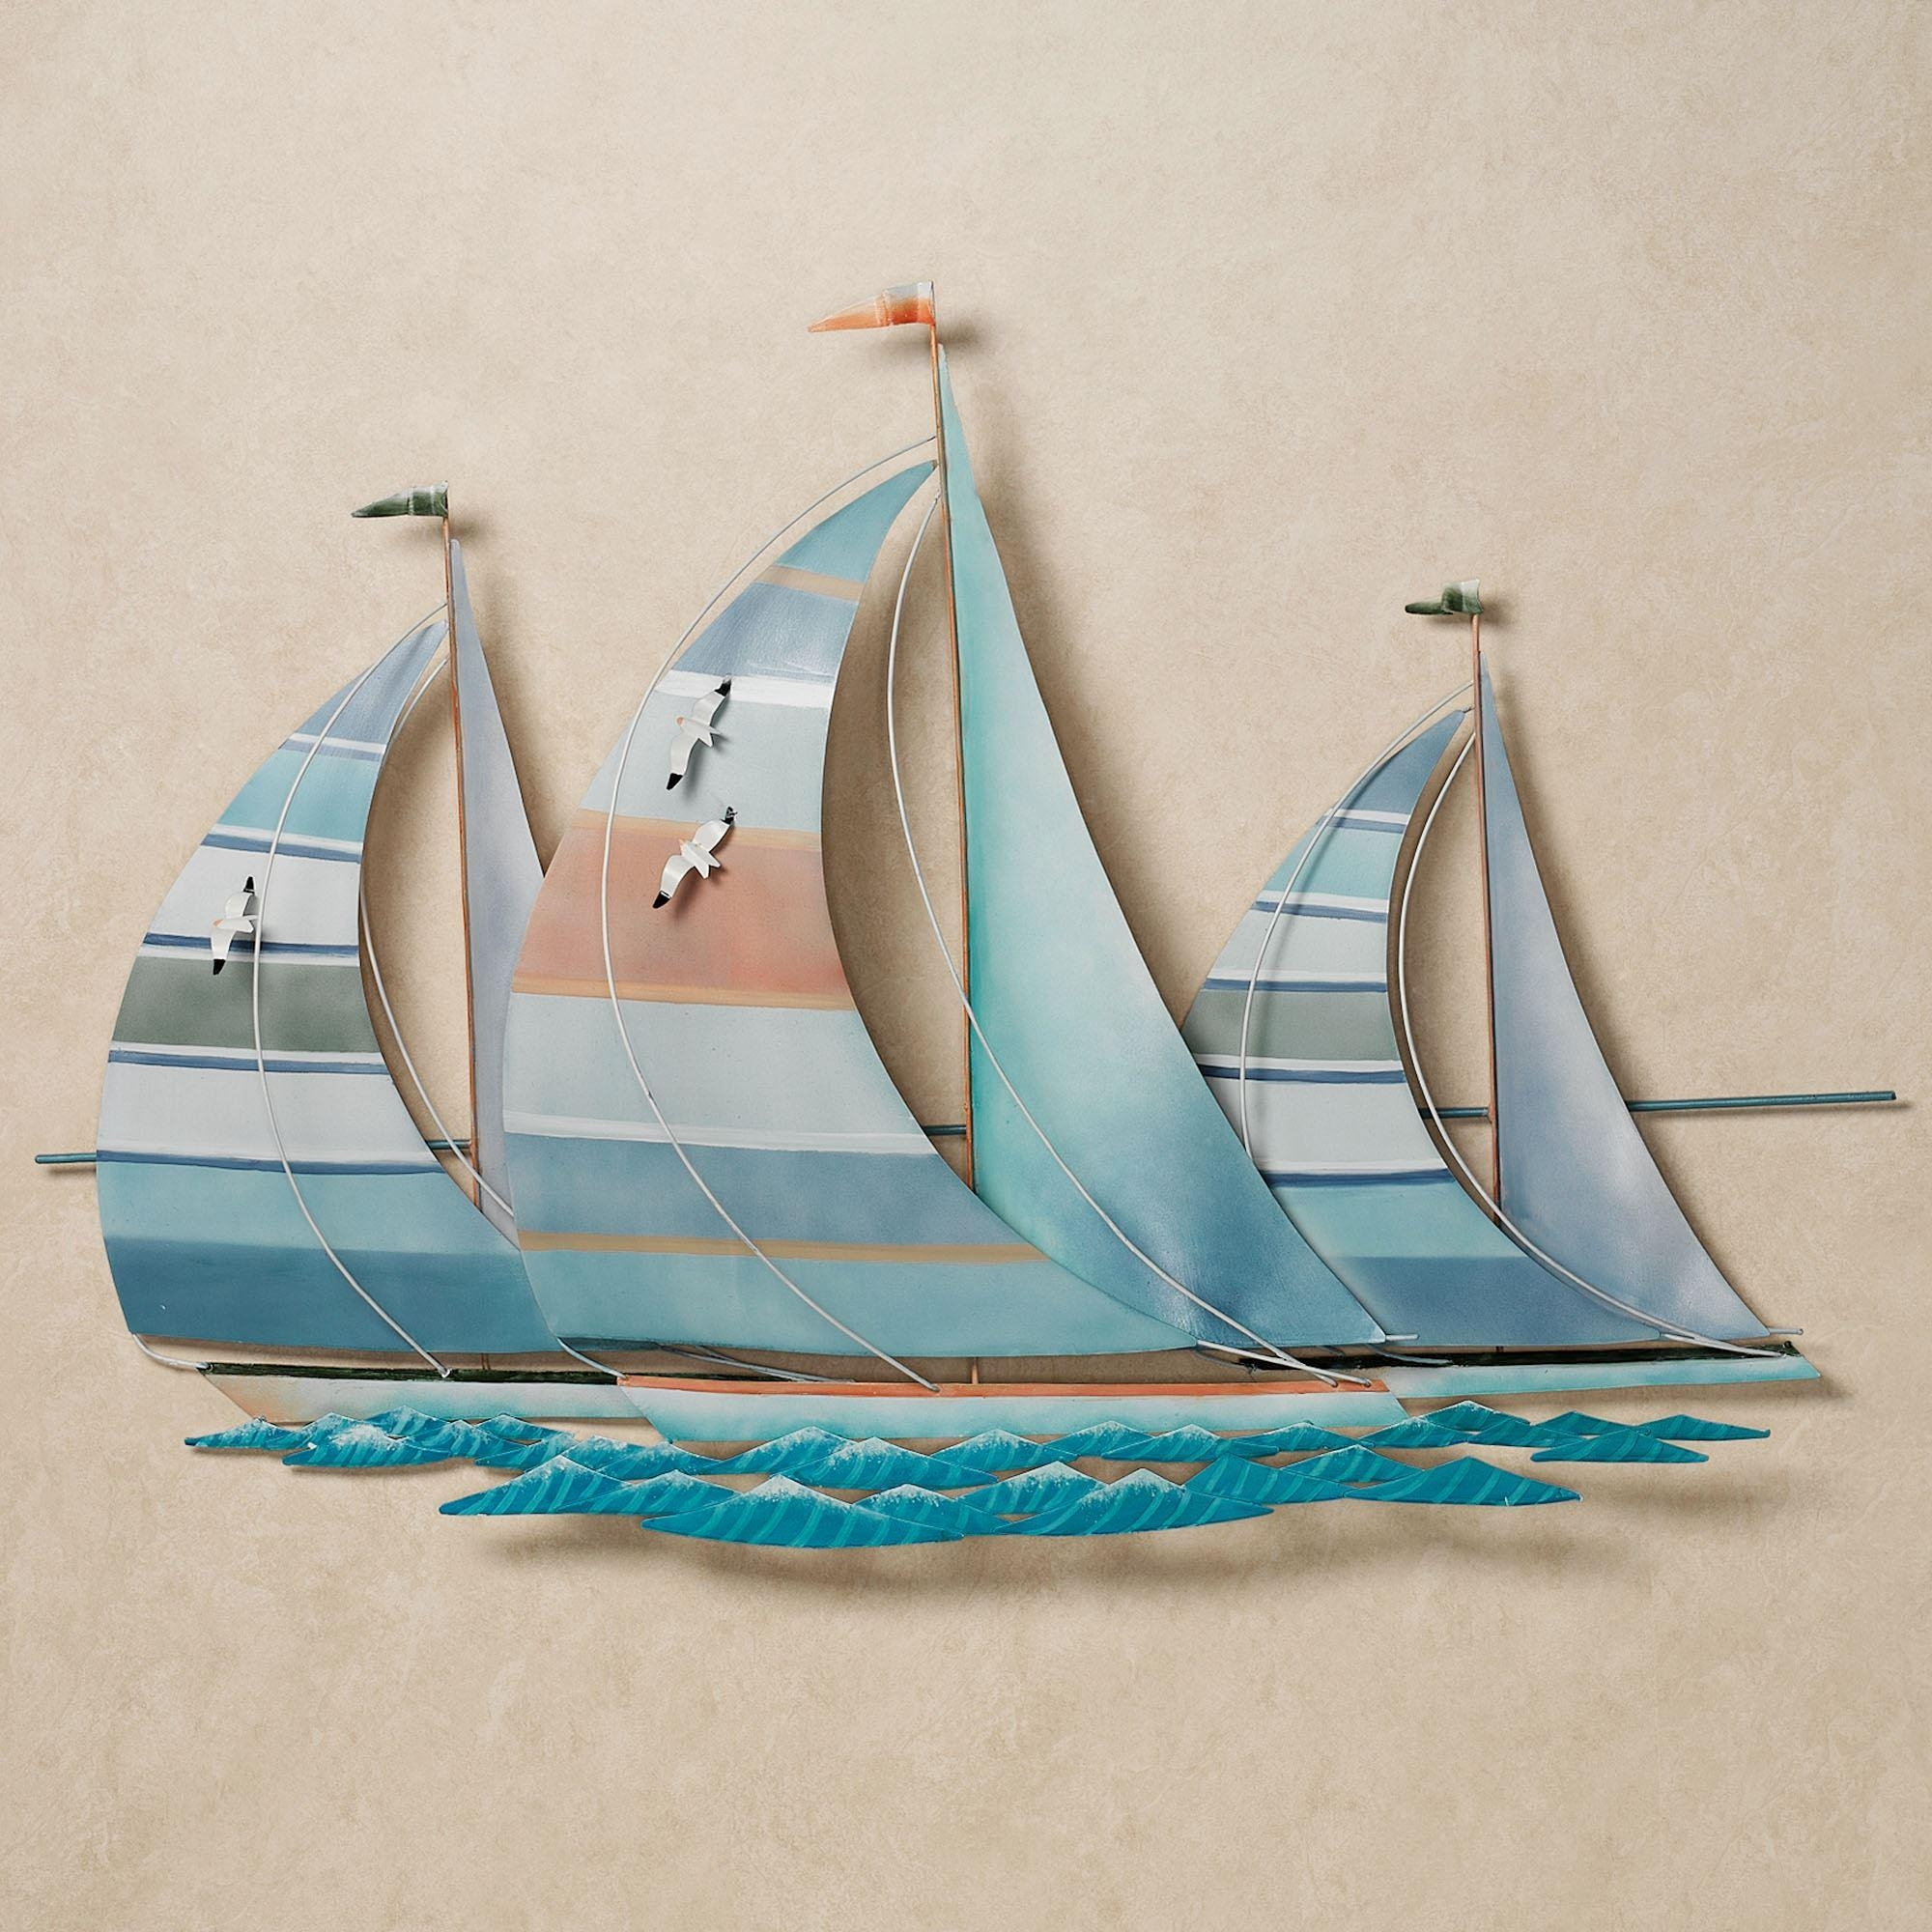 Regatta Finish Line Multi Cool Metal Sailboat Wall Sculpture intended for Metal Sailboat Wall Art